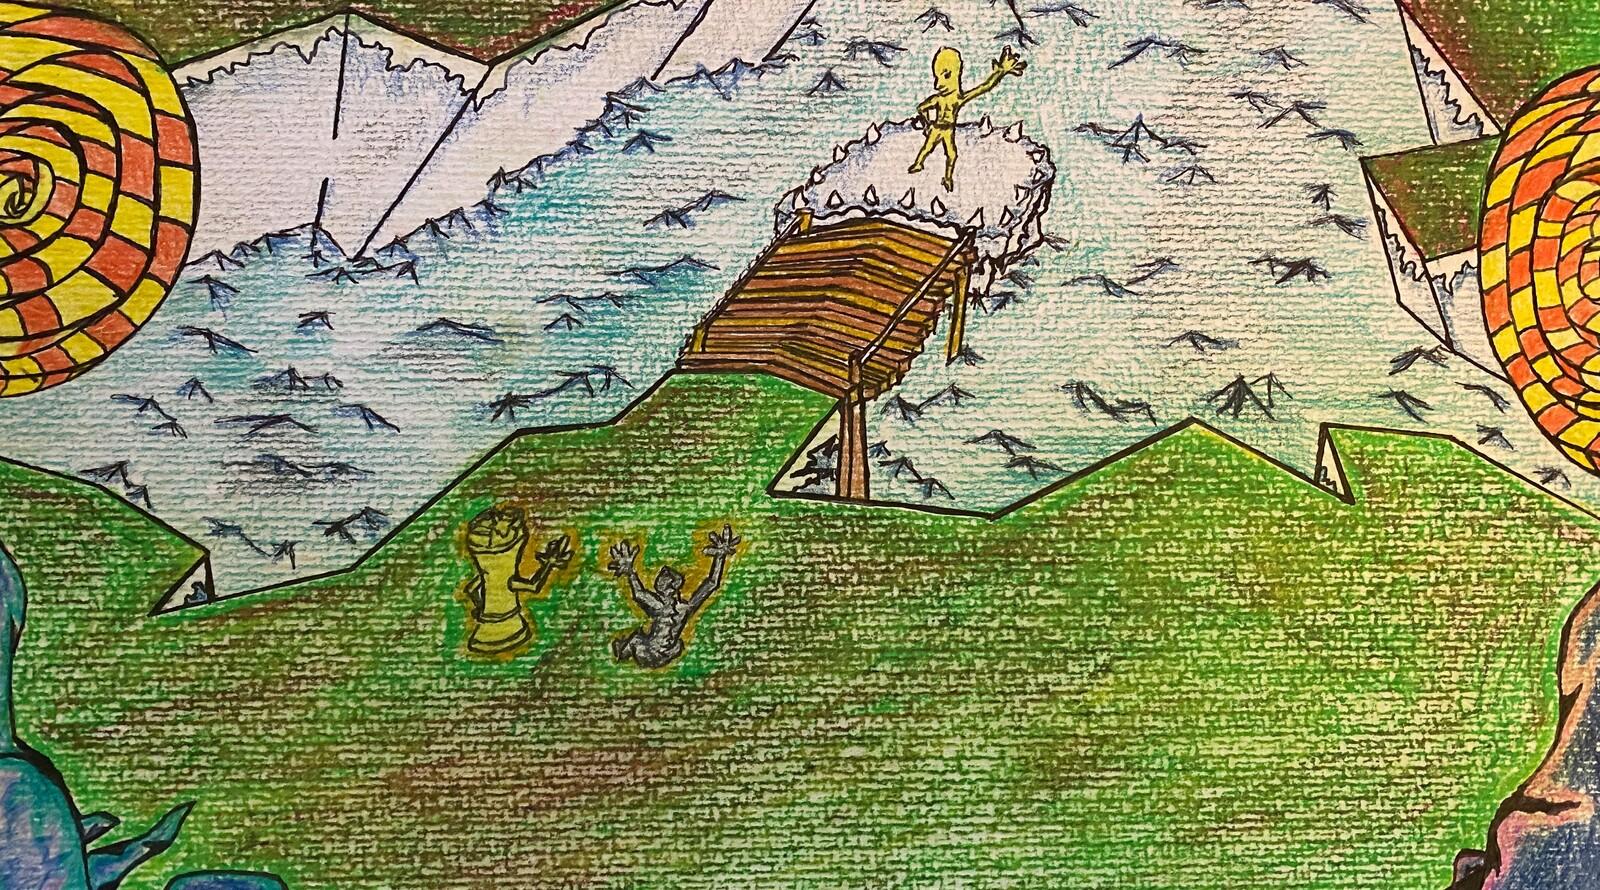 #themisadventuresofdwort #patrickhale #rooksproductions #childrensbooks